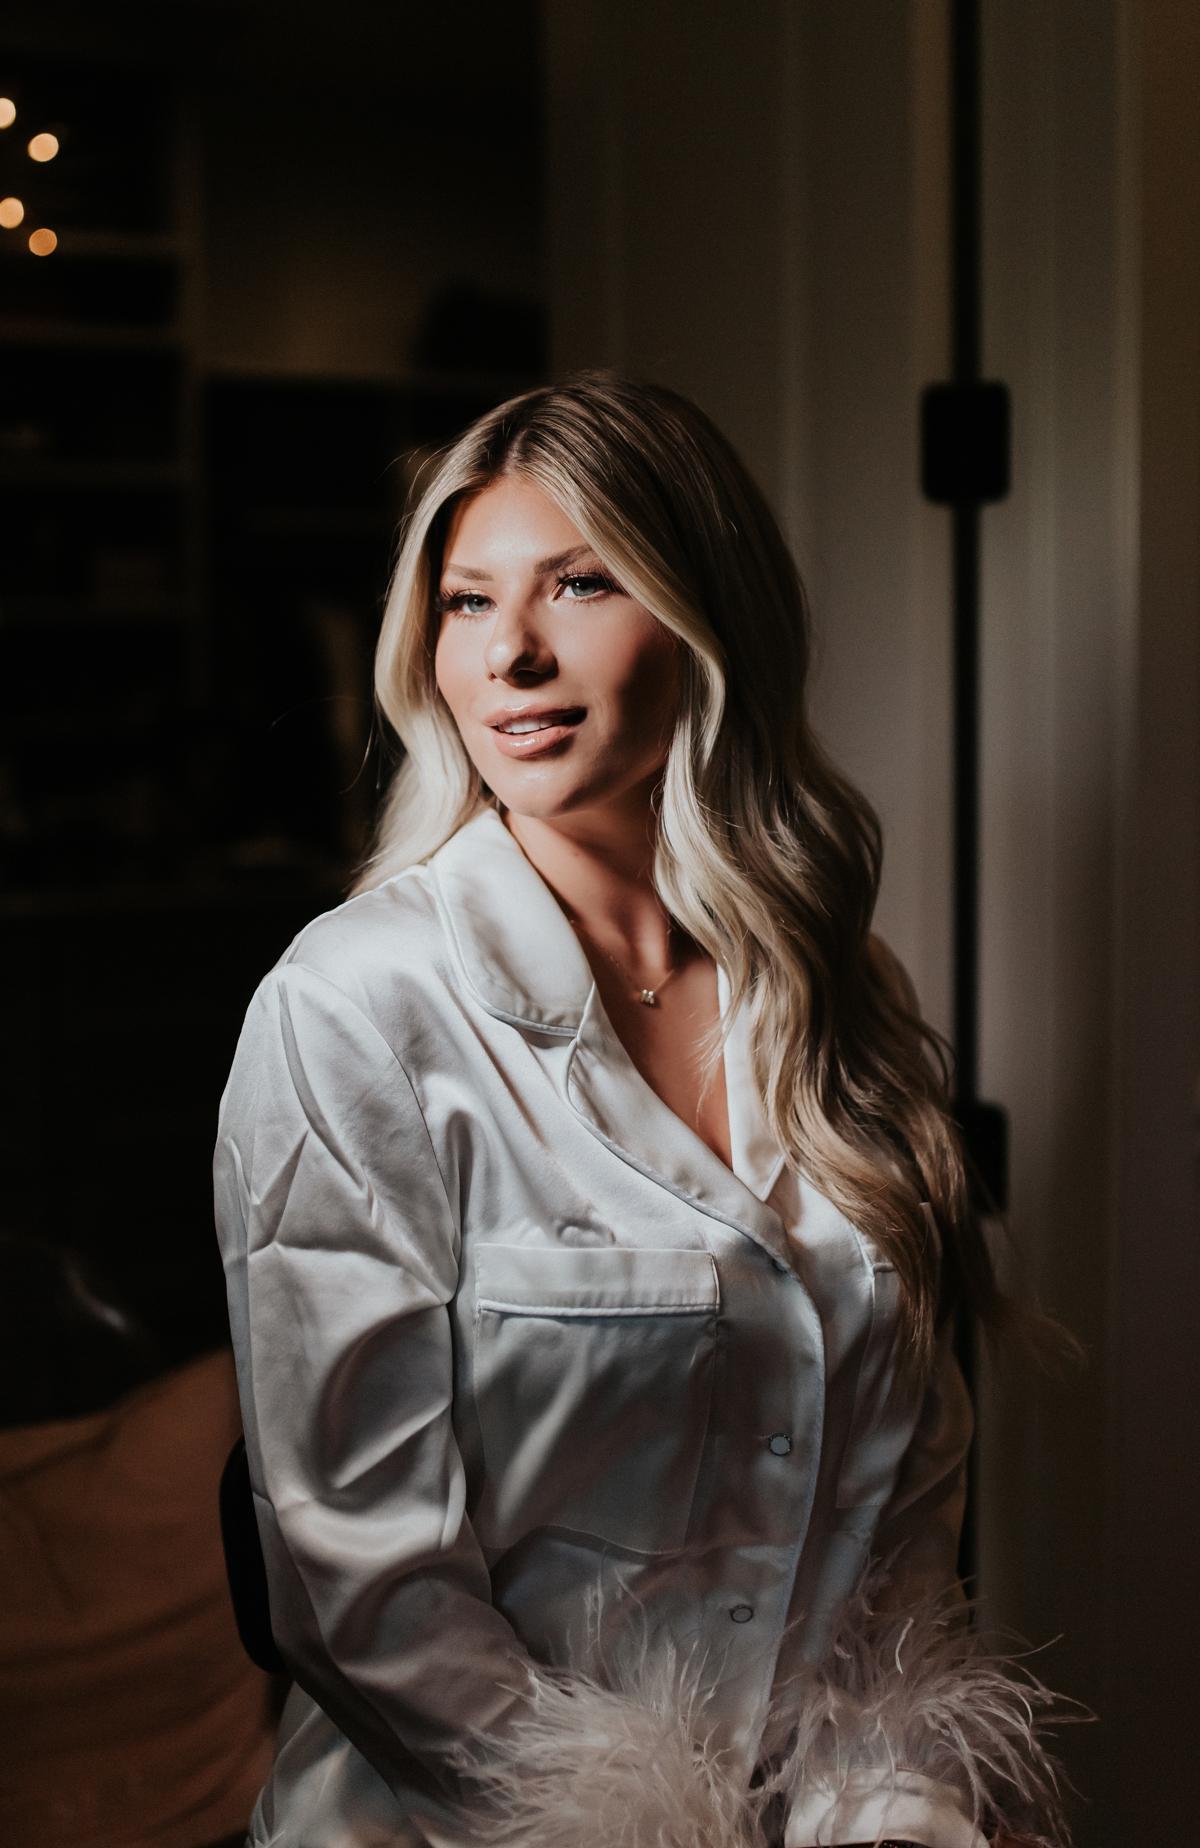 Megan Claire Photography | Arizona Wedding Photographer. Jaylee Merrill's Pajama Themed Bridal Shower @meganclairephoto